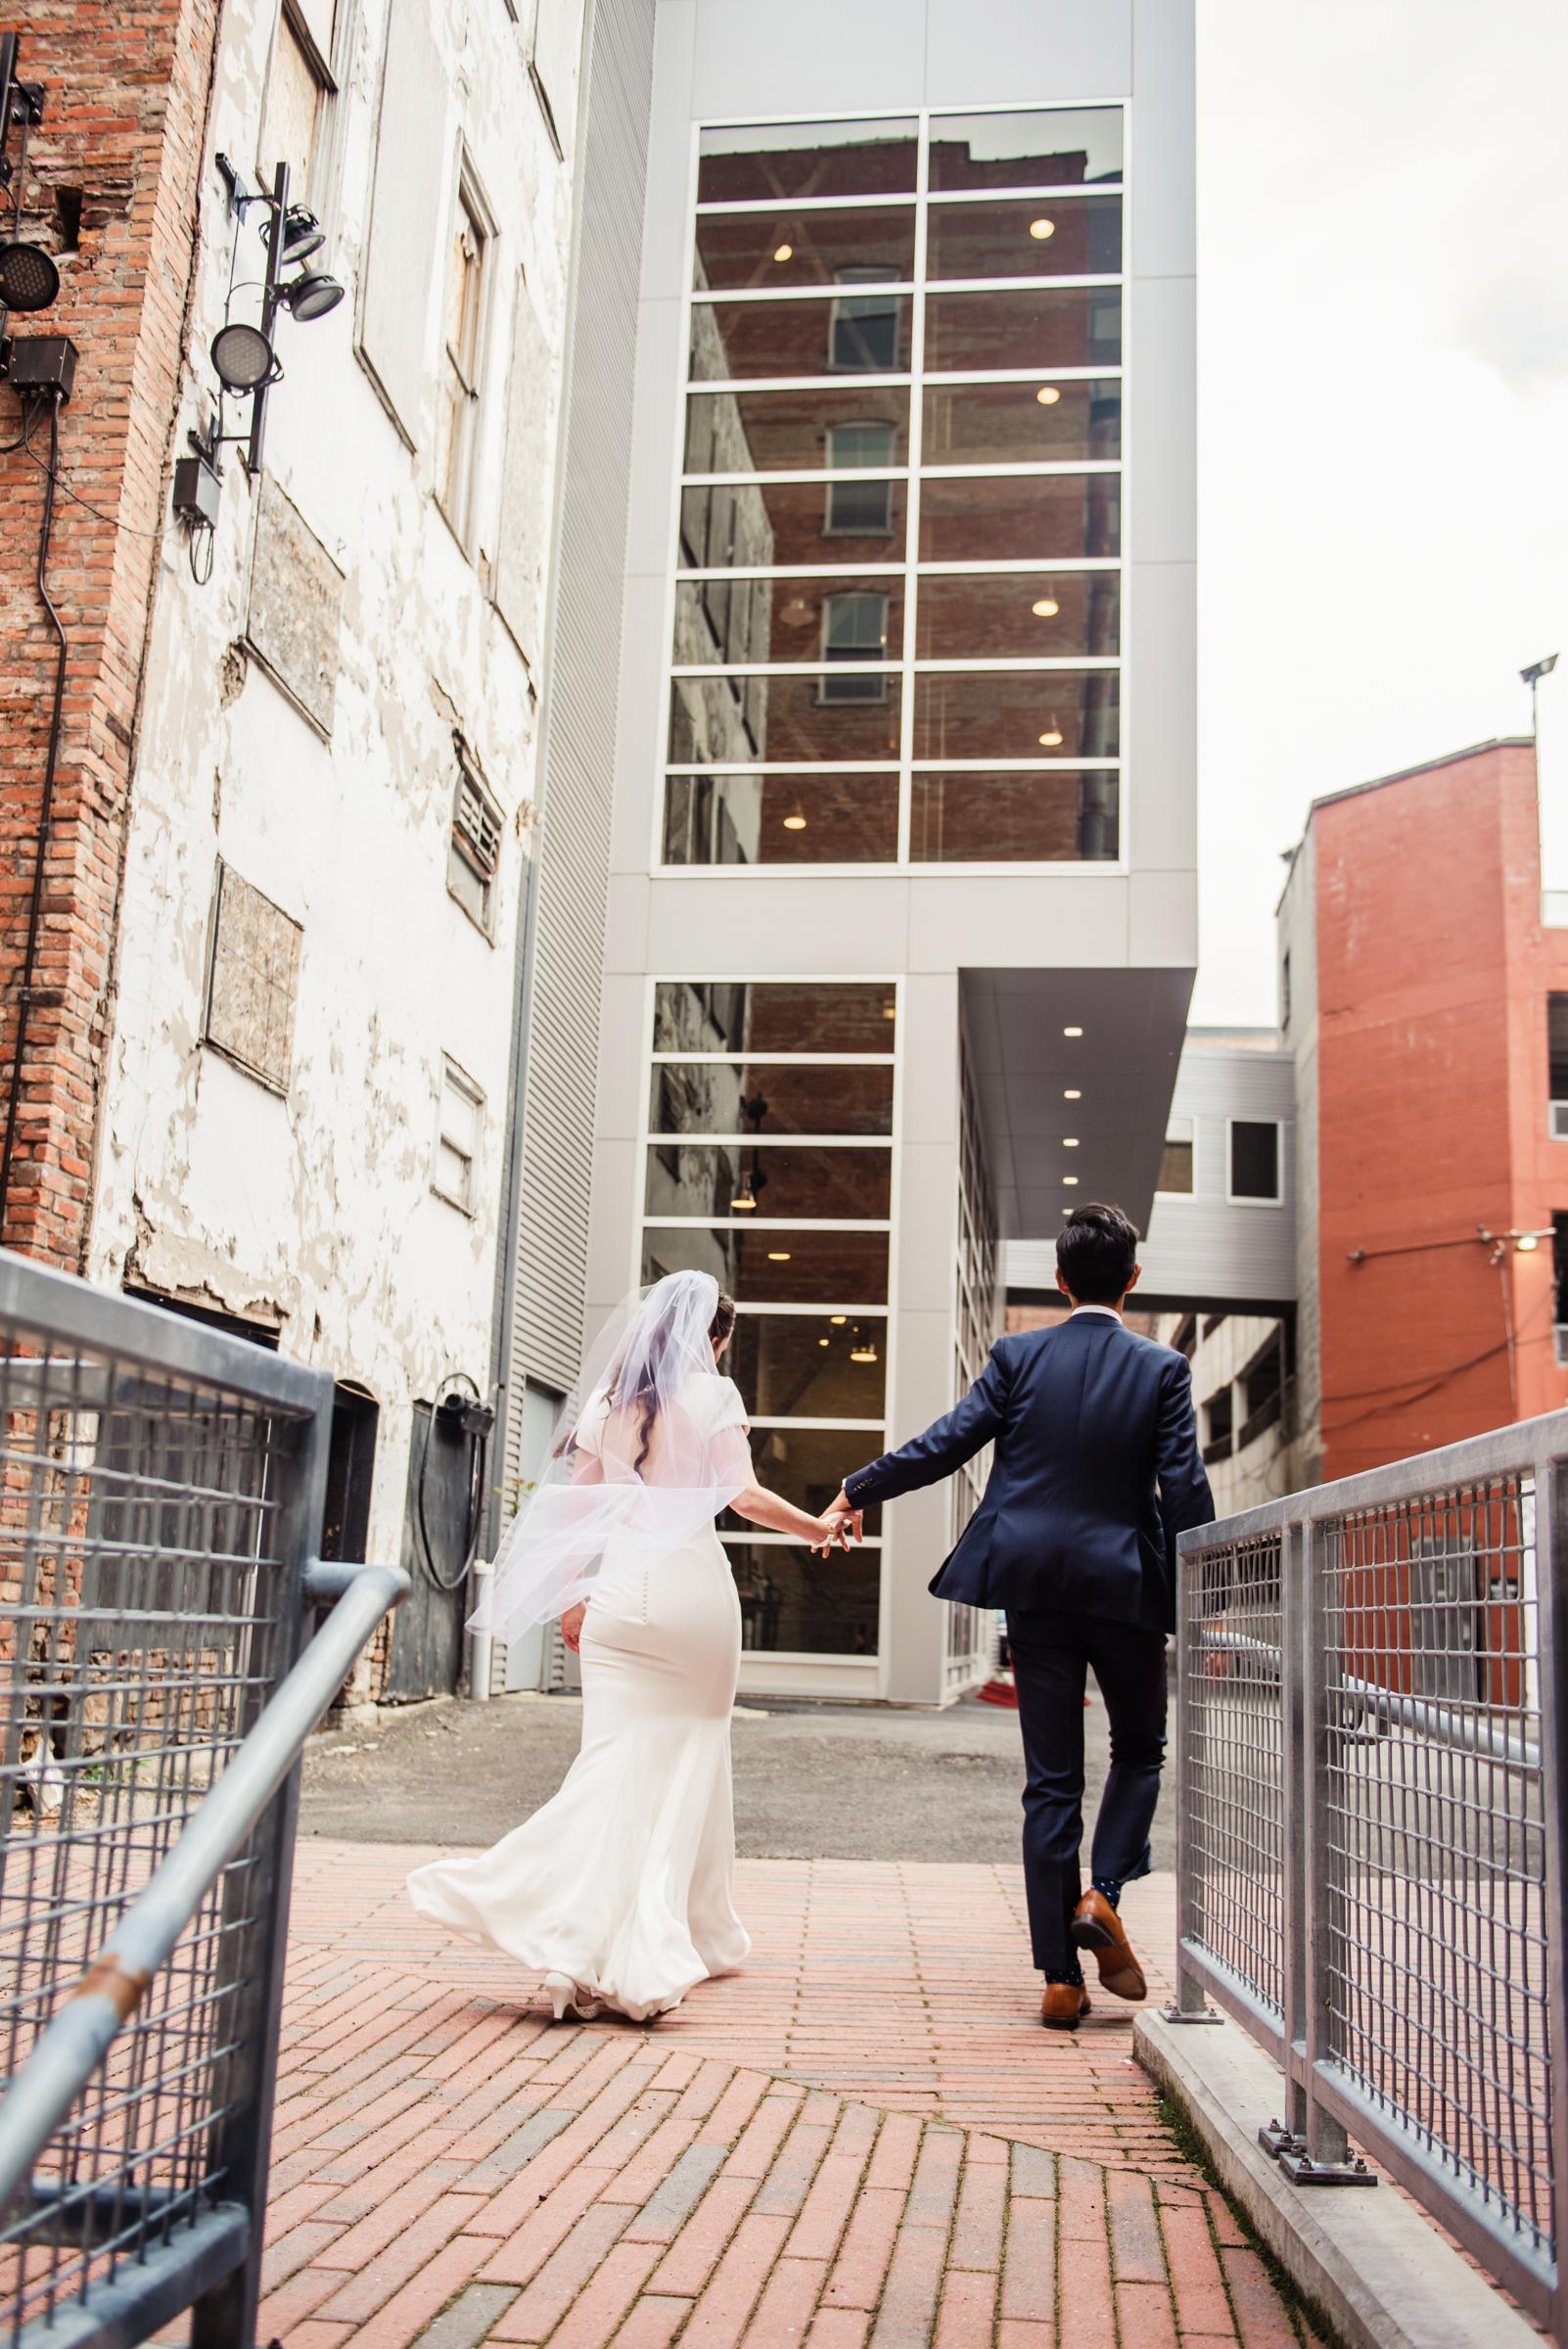 SKY_Armory_Syracuse_Wedding_JILL_STUDIO_Rochester_NY_Photographer_DSC_6017.jpg